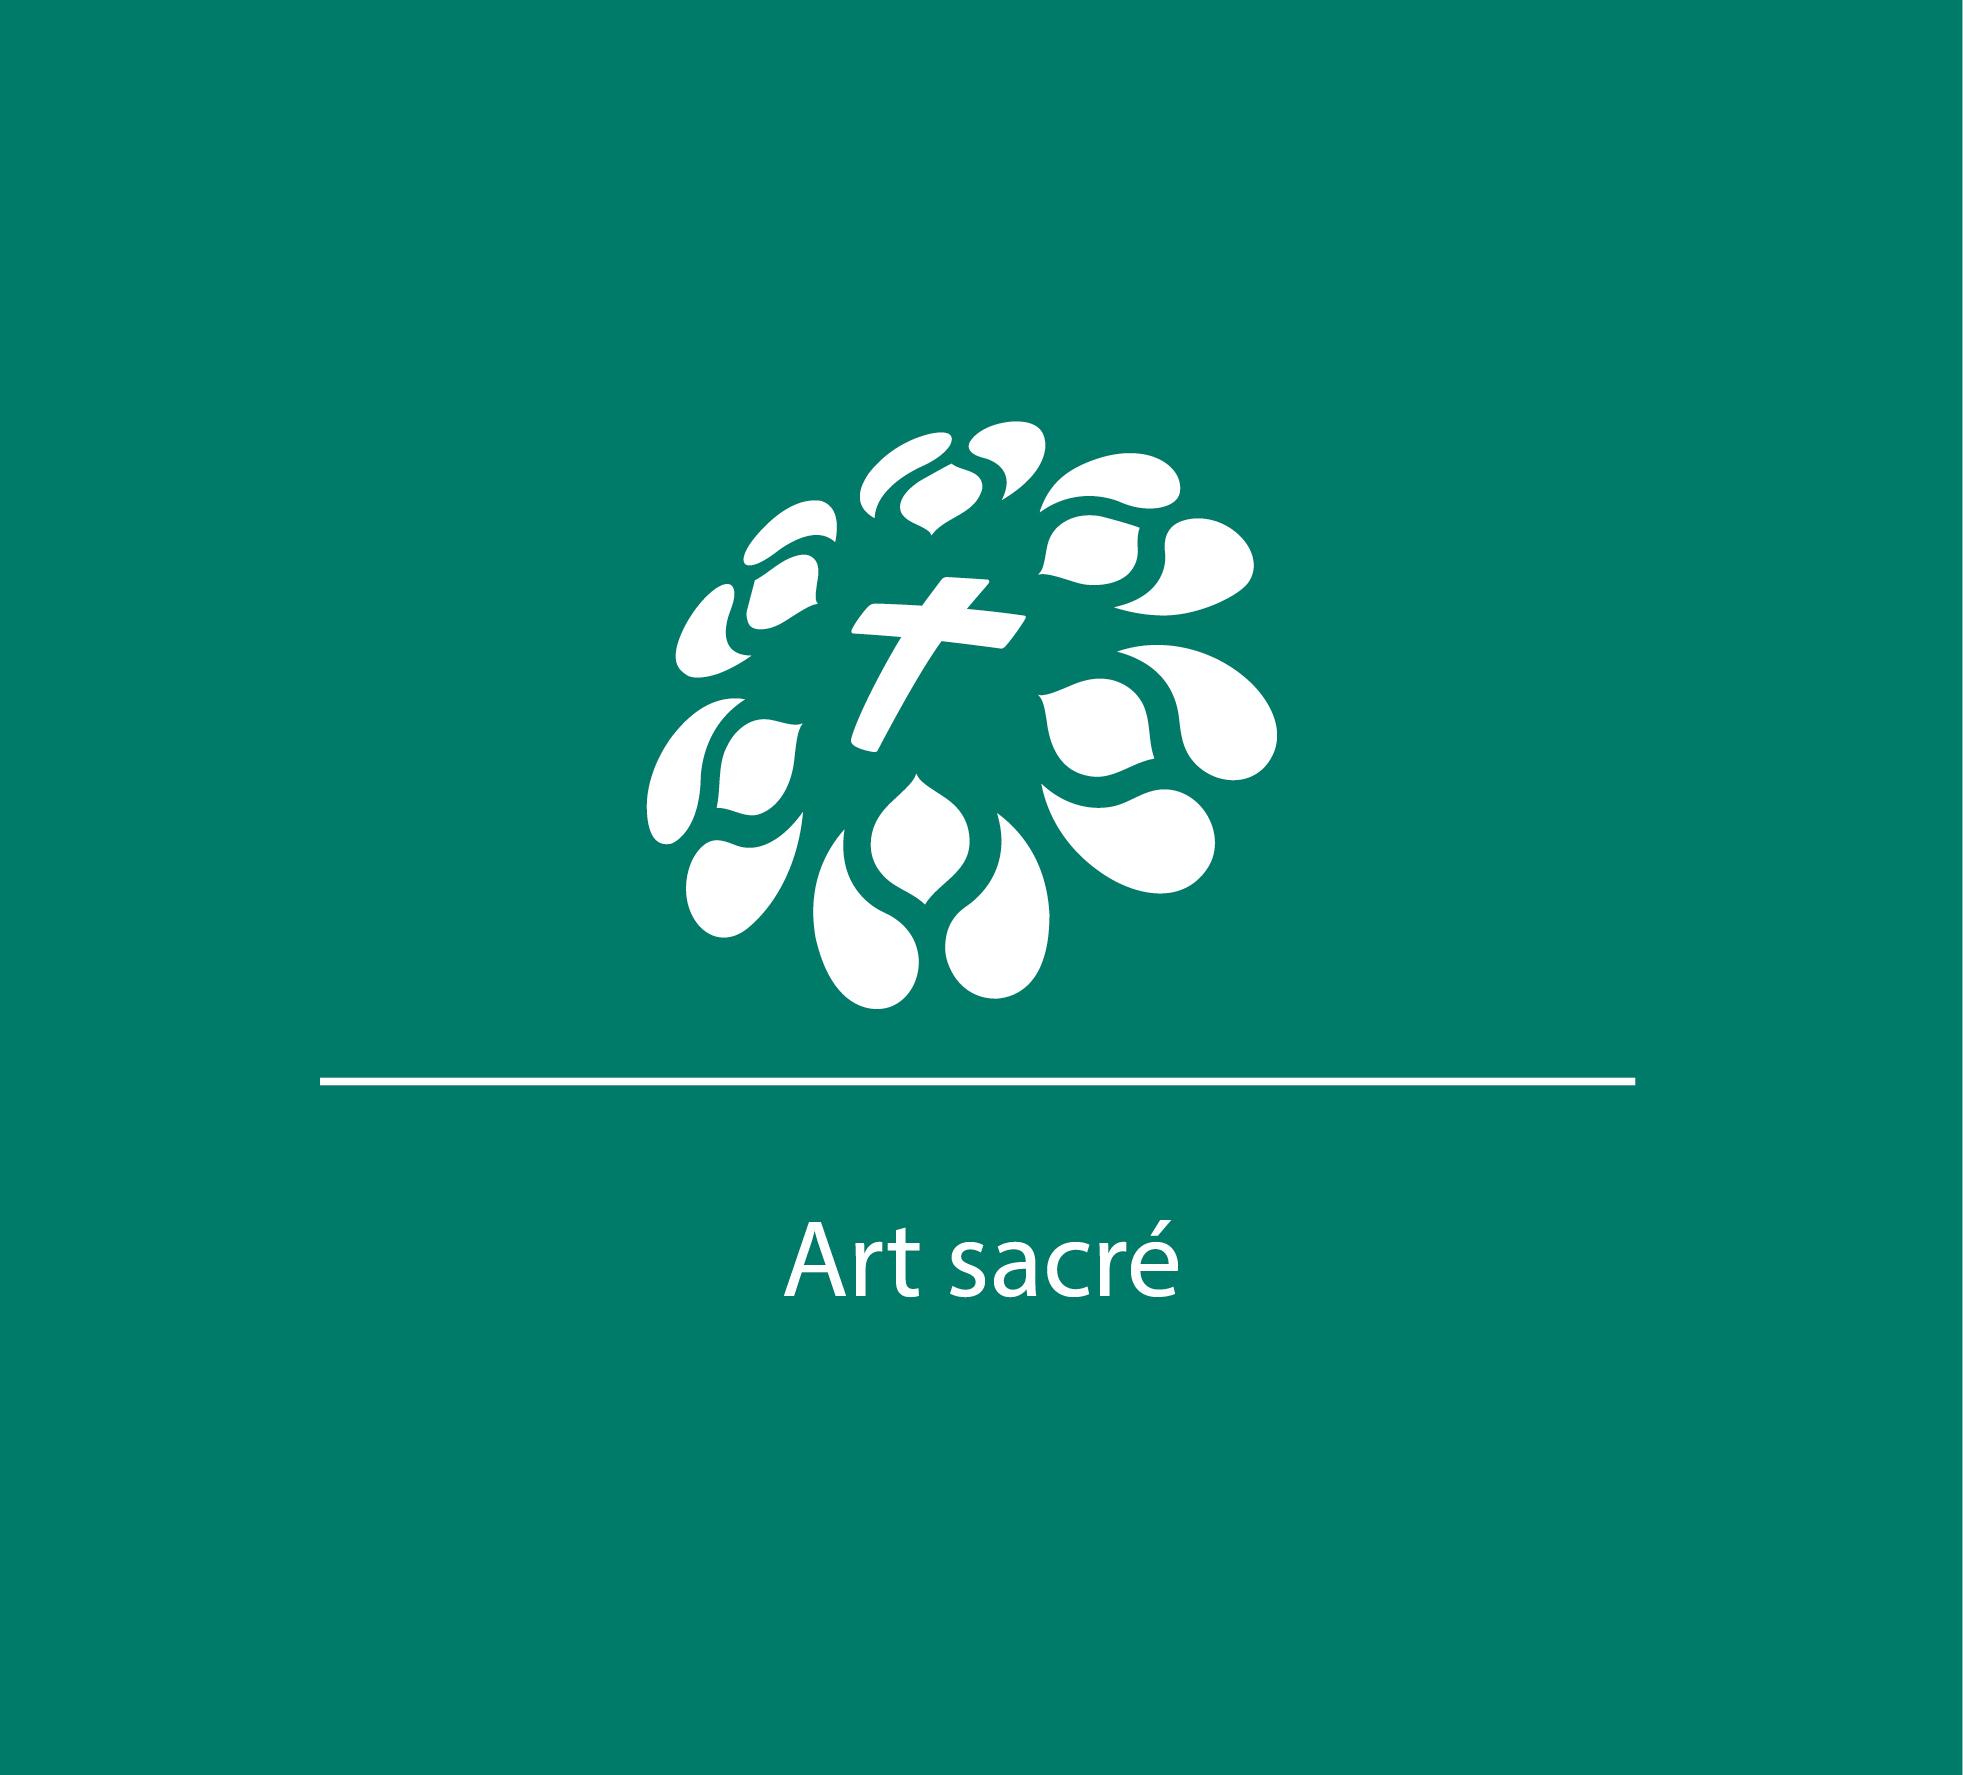 logo Art sacré